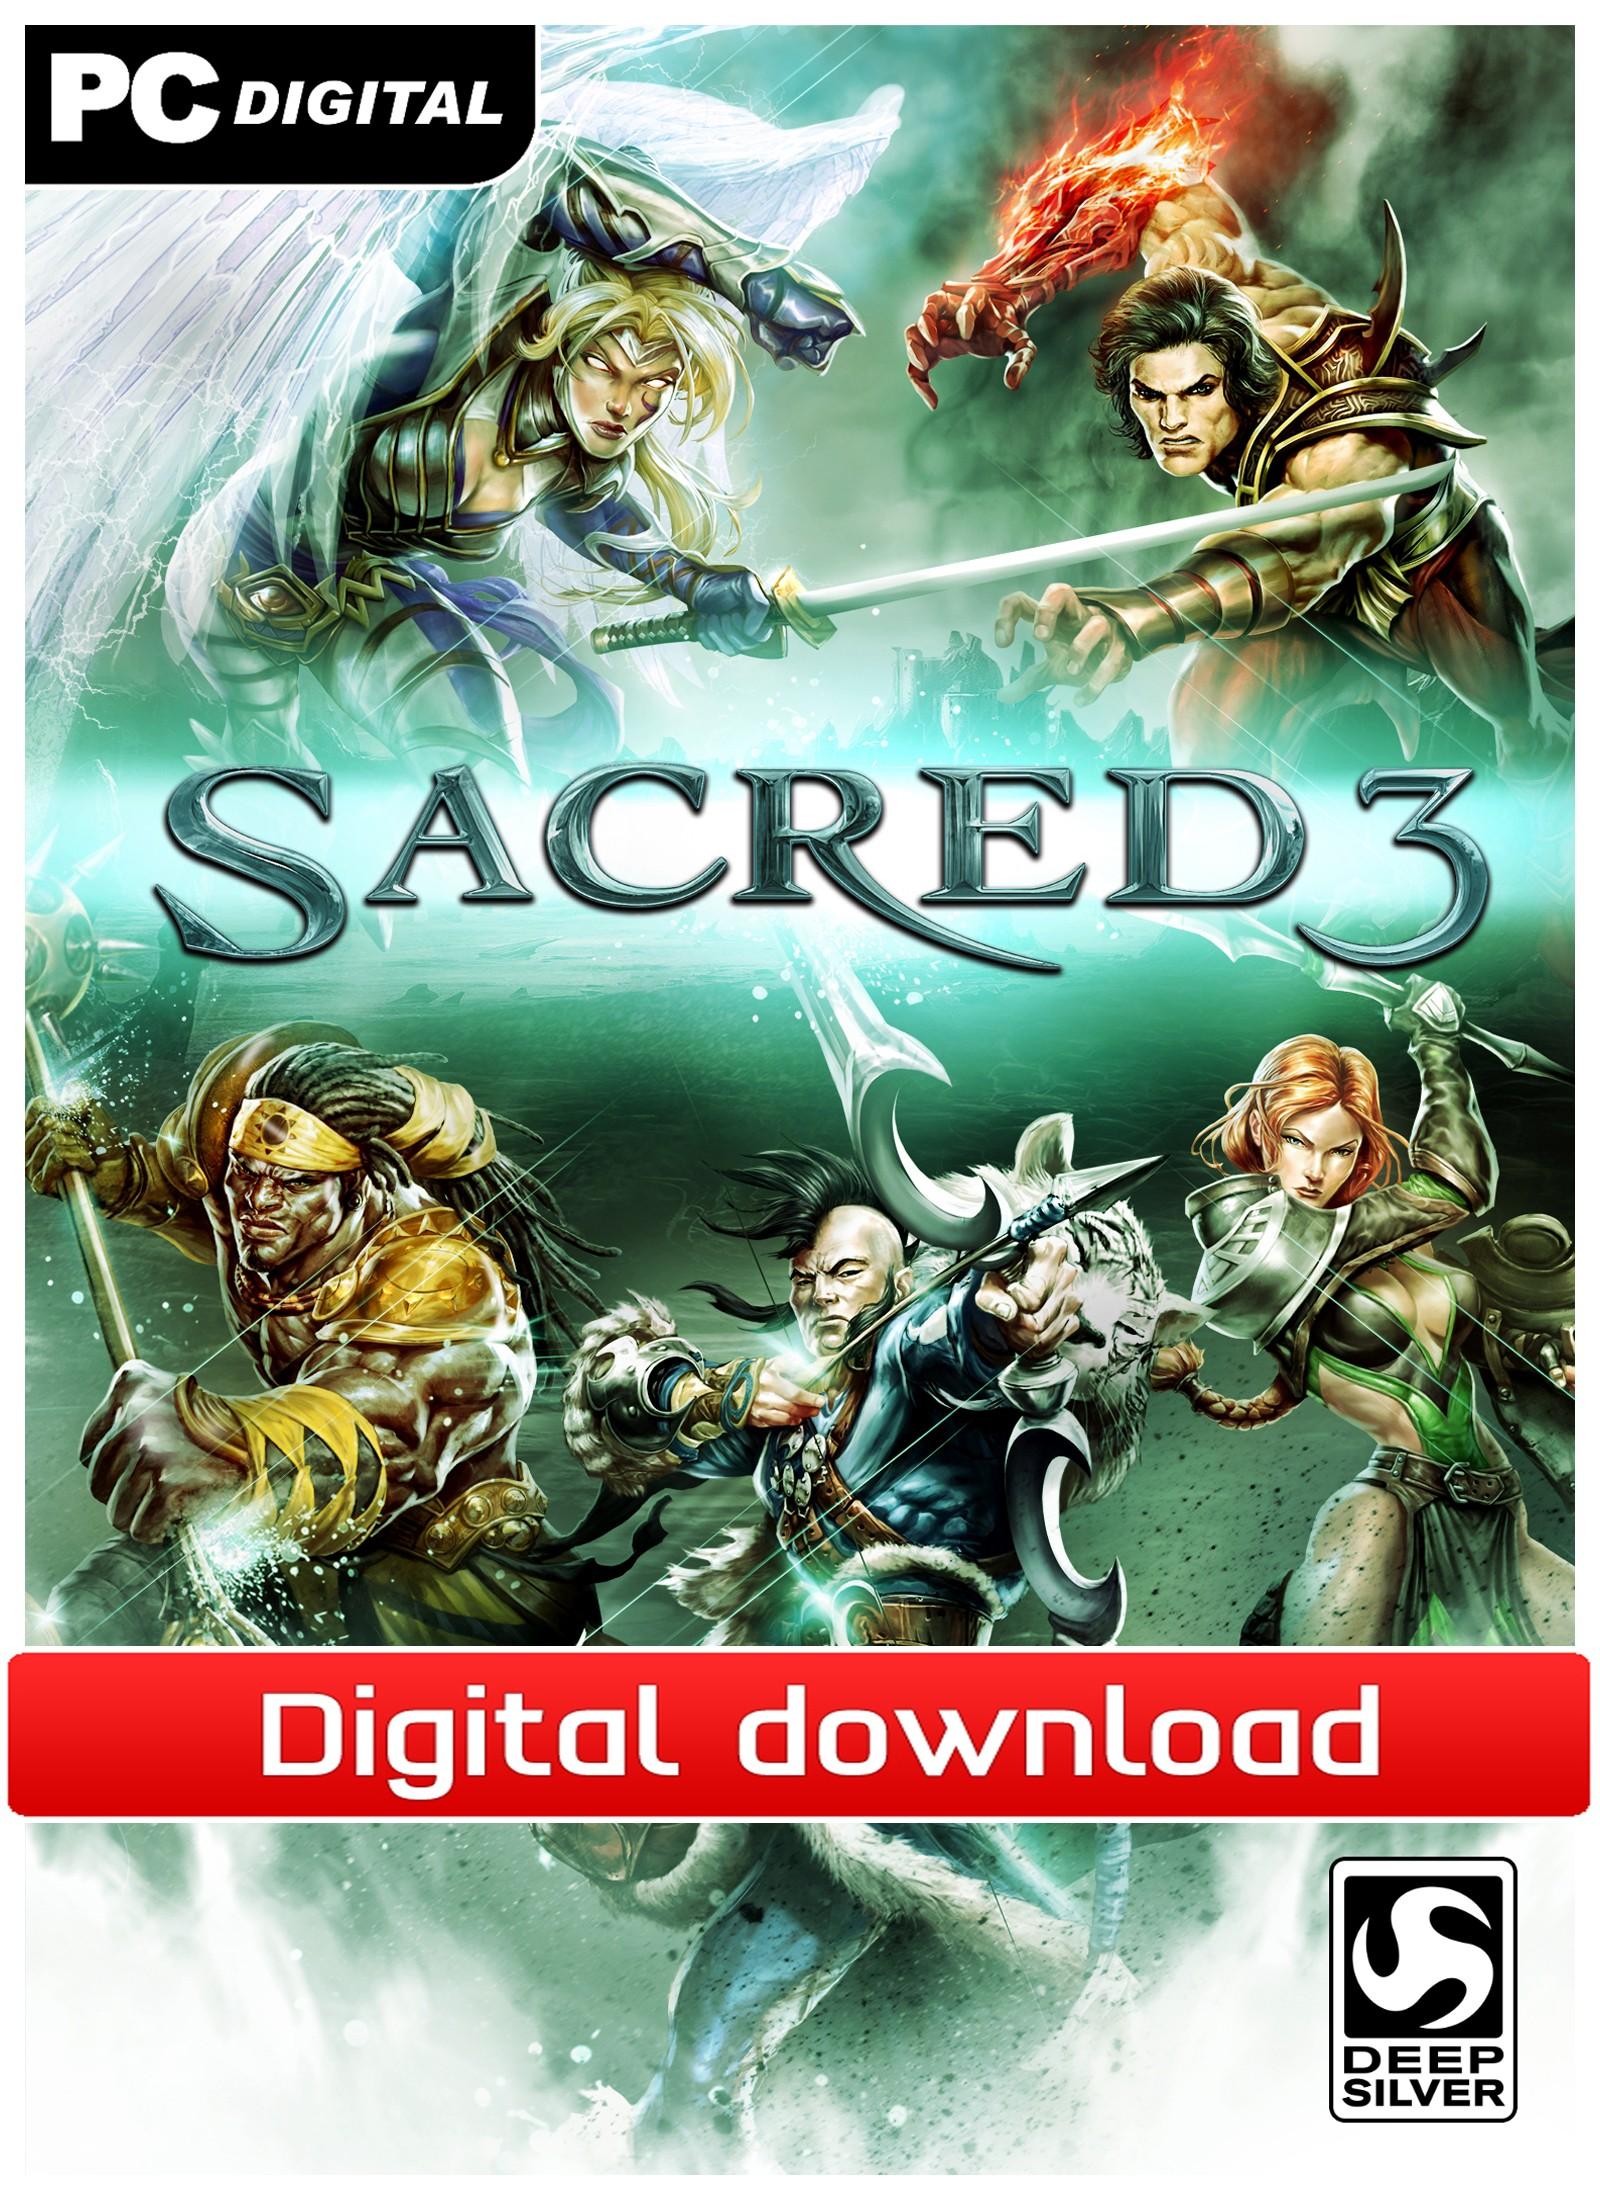 35396 : Sacred 3 - Malakhim DLC (PC nedlastning)